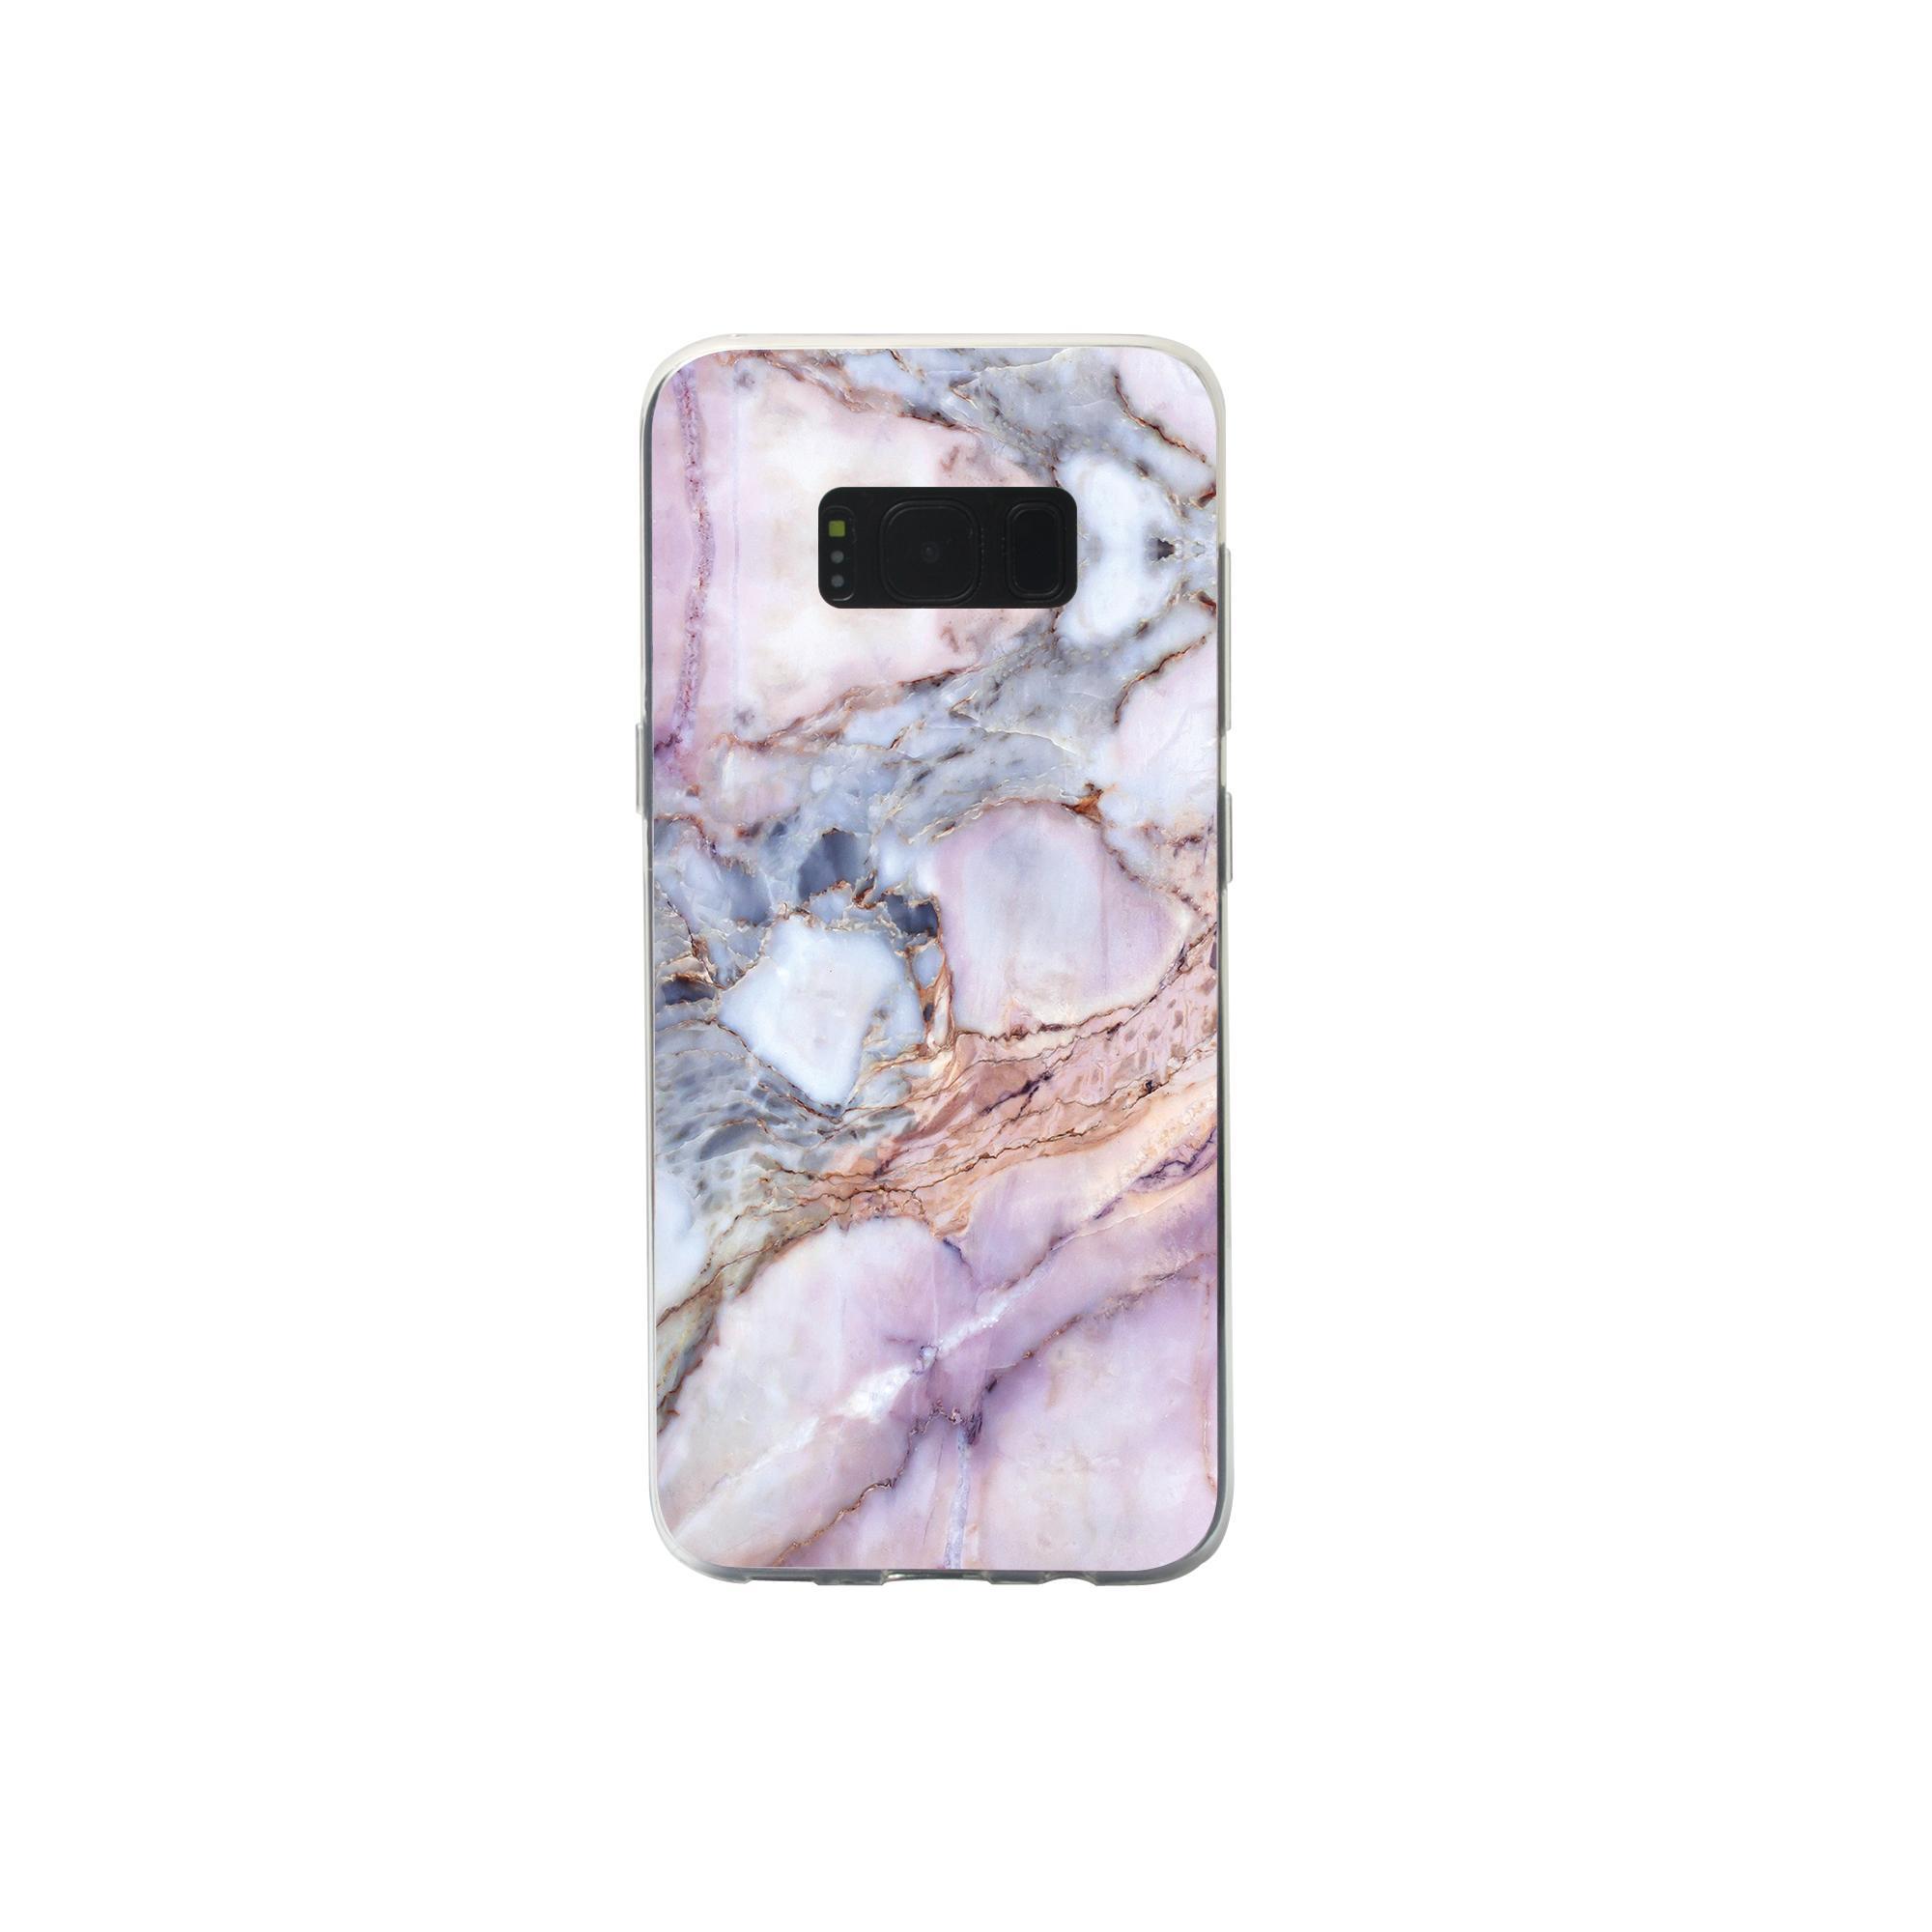 IMD Samsung Galaxy S8 Glossy Soft Marble TPU Case 1